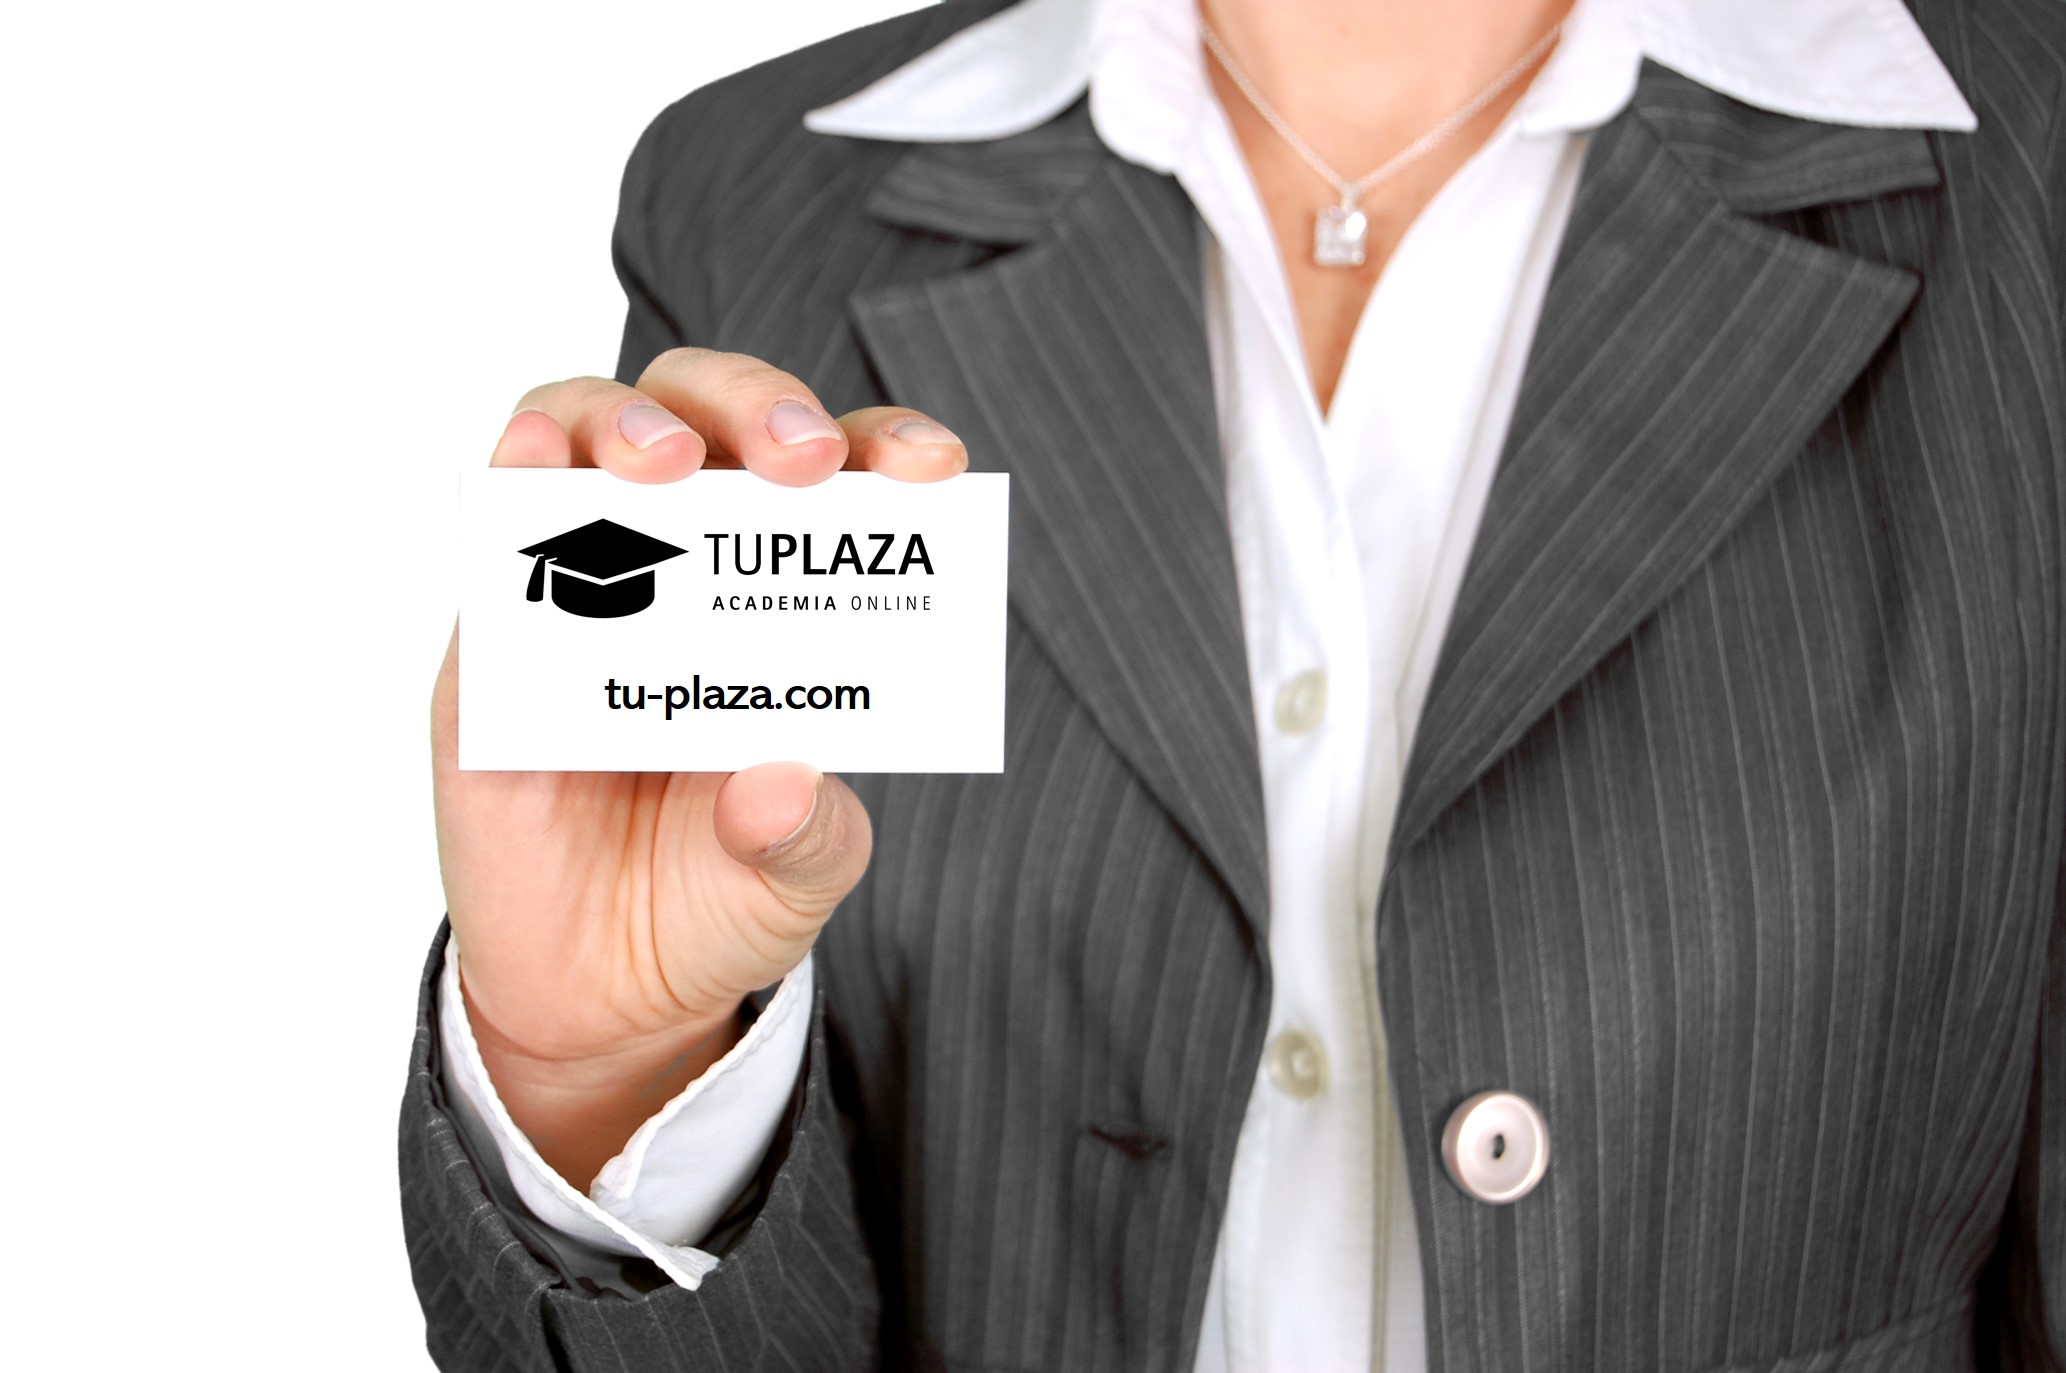 tutor-experto-tu-plaza